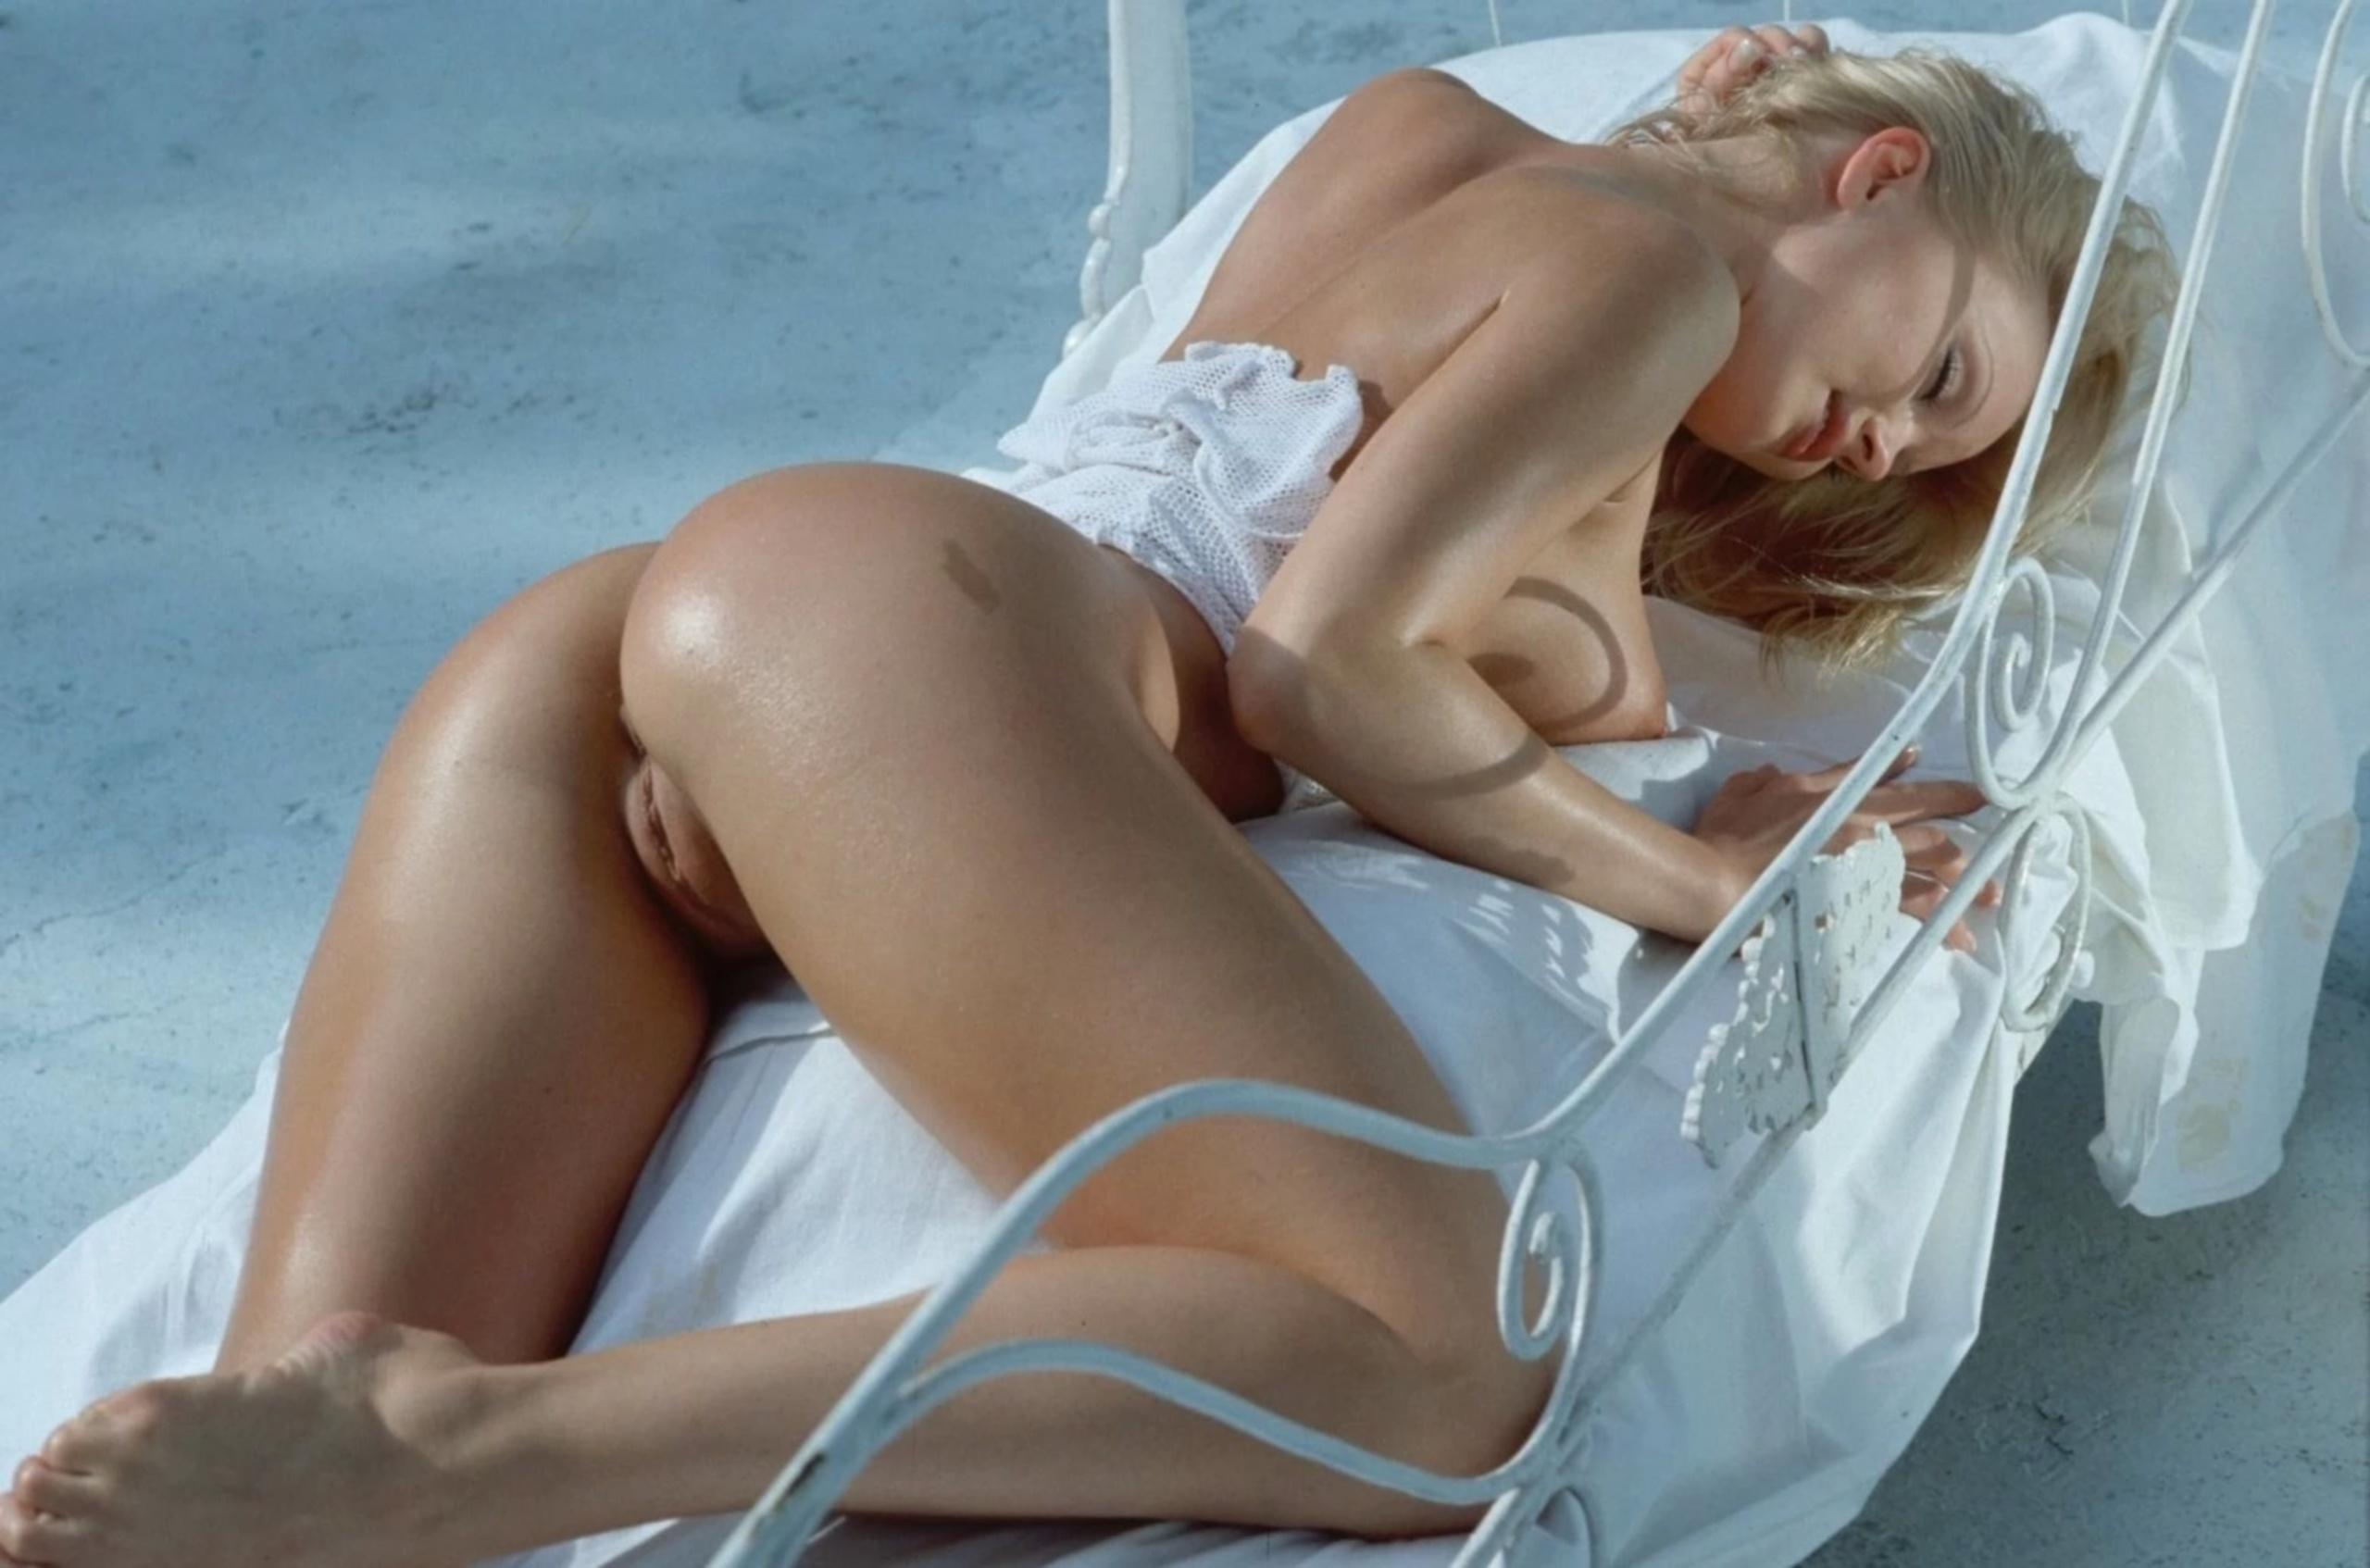 Girl stripping big boobs